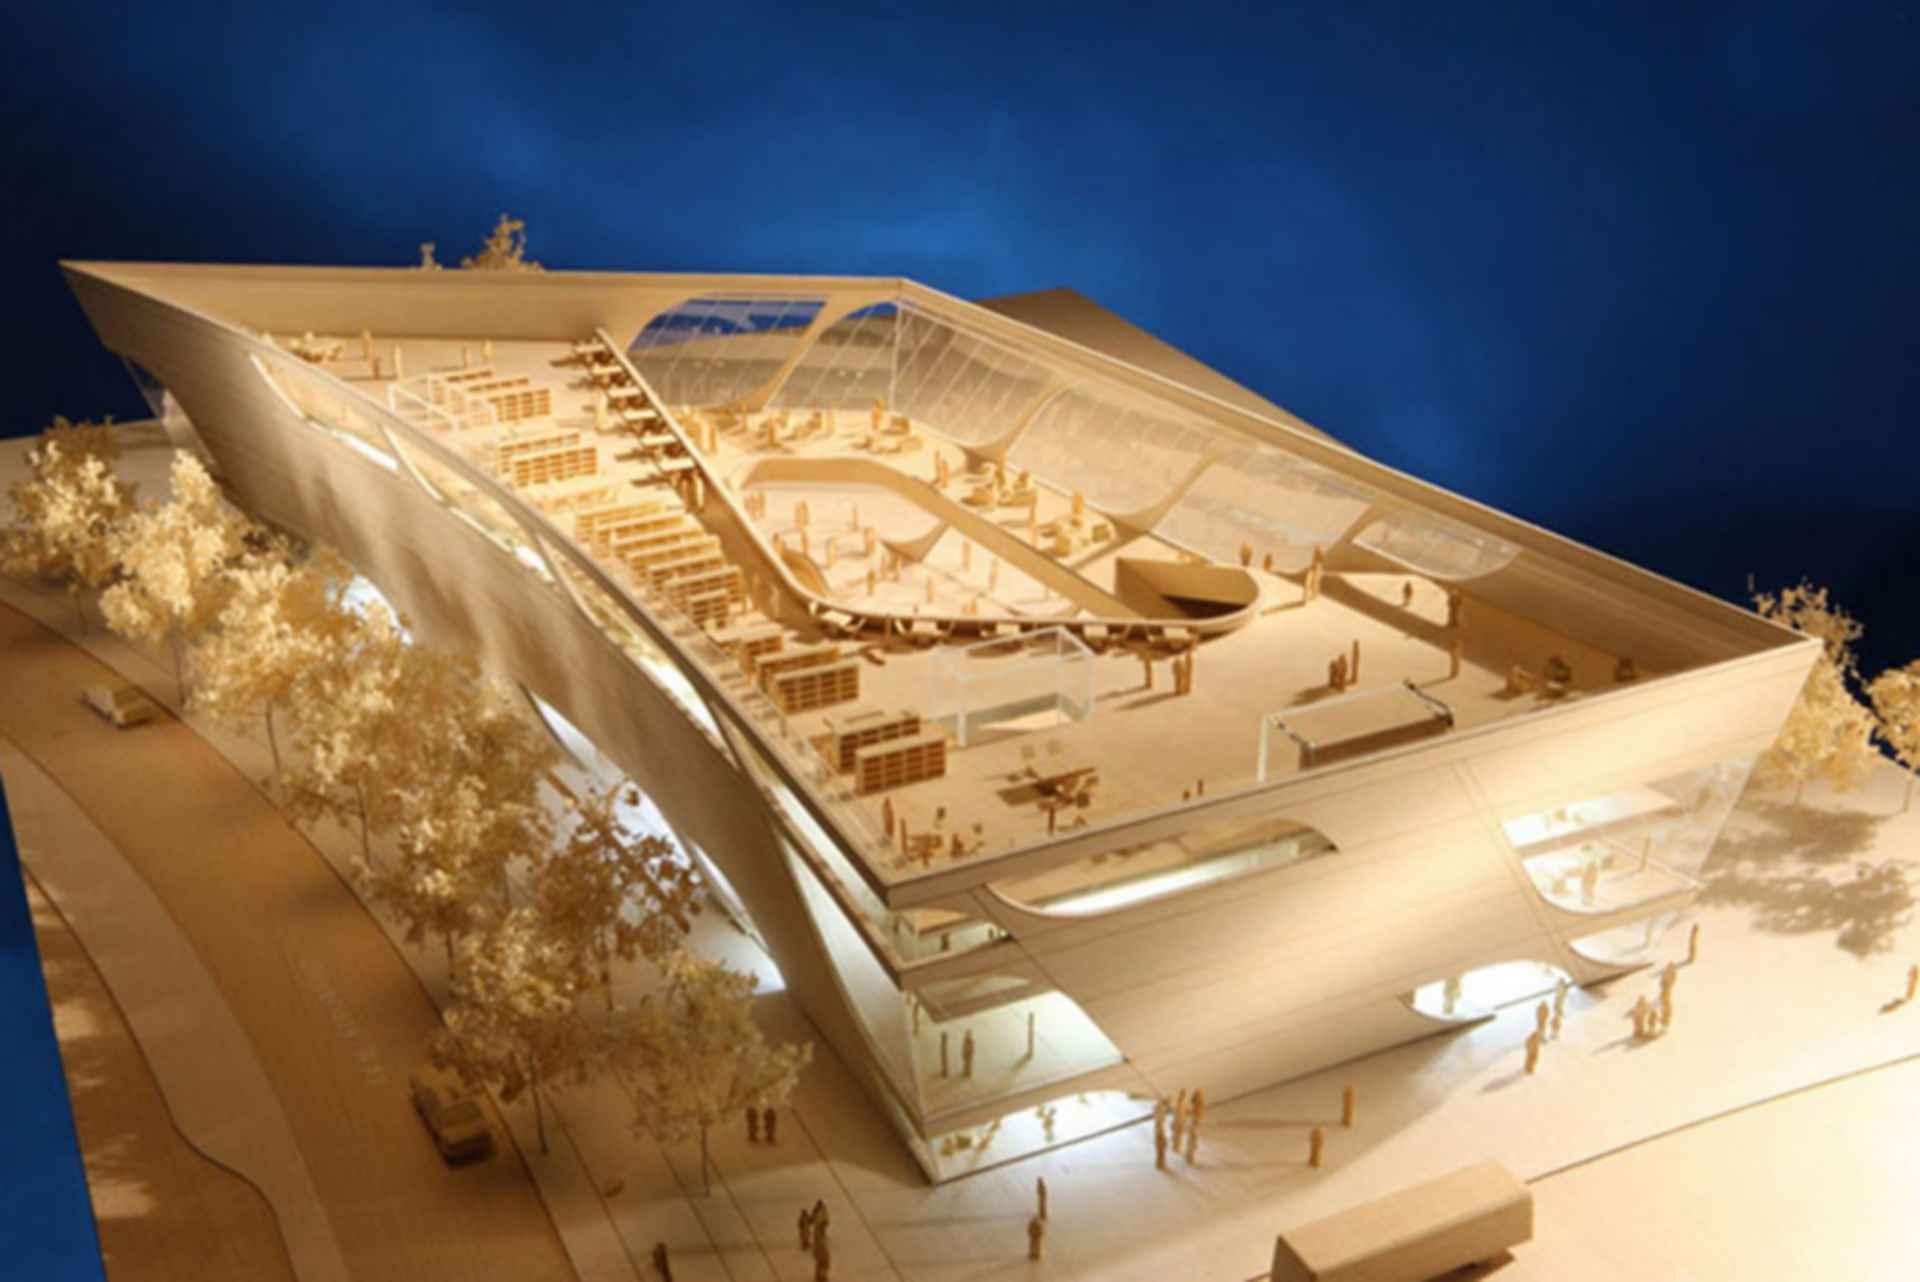 Surrey City Center Library - concept design